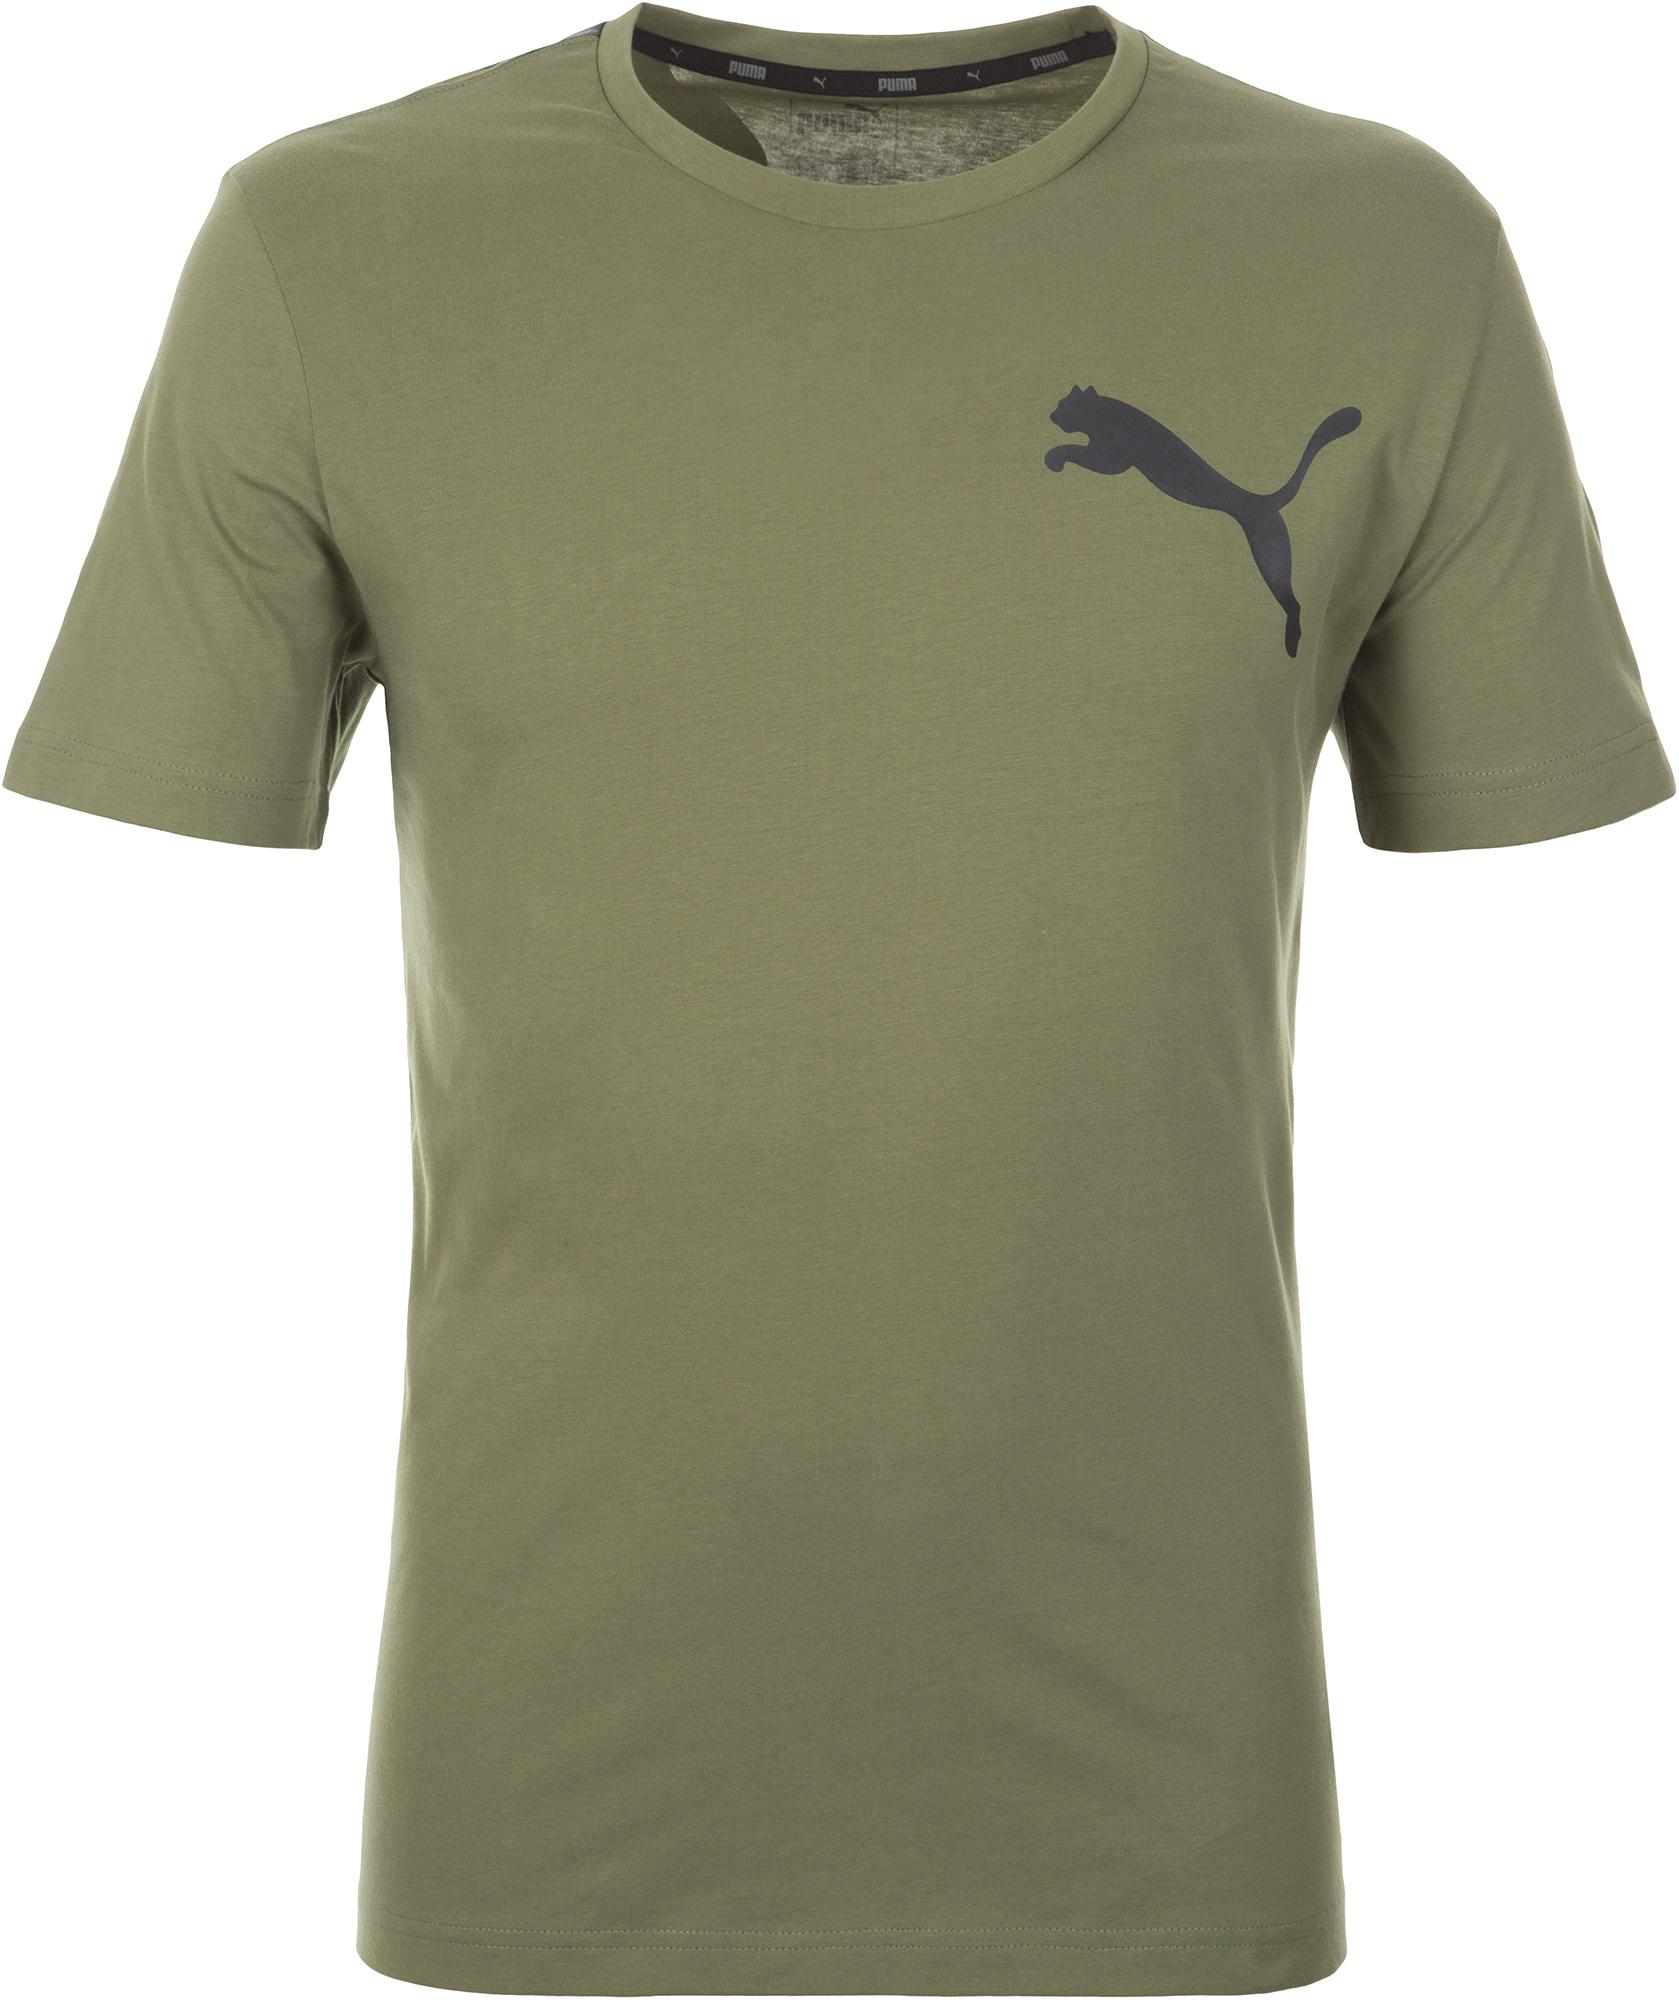 Puma Футболка мужская Puma, размер 48-50